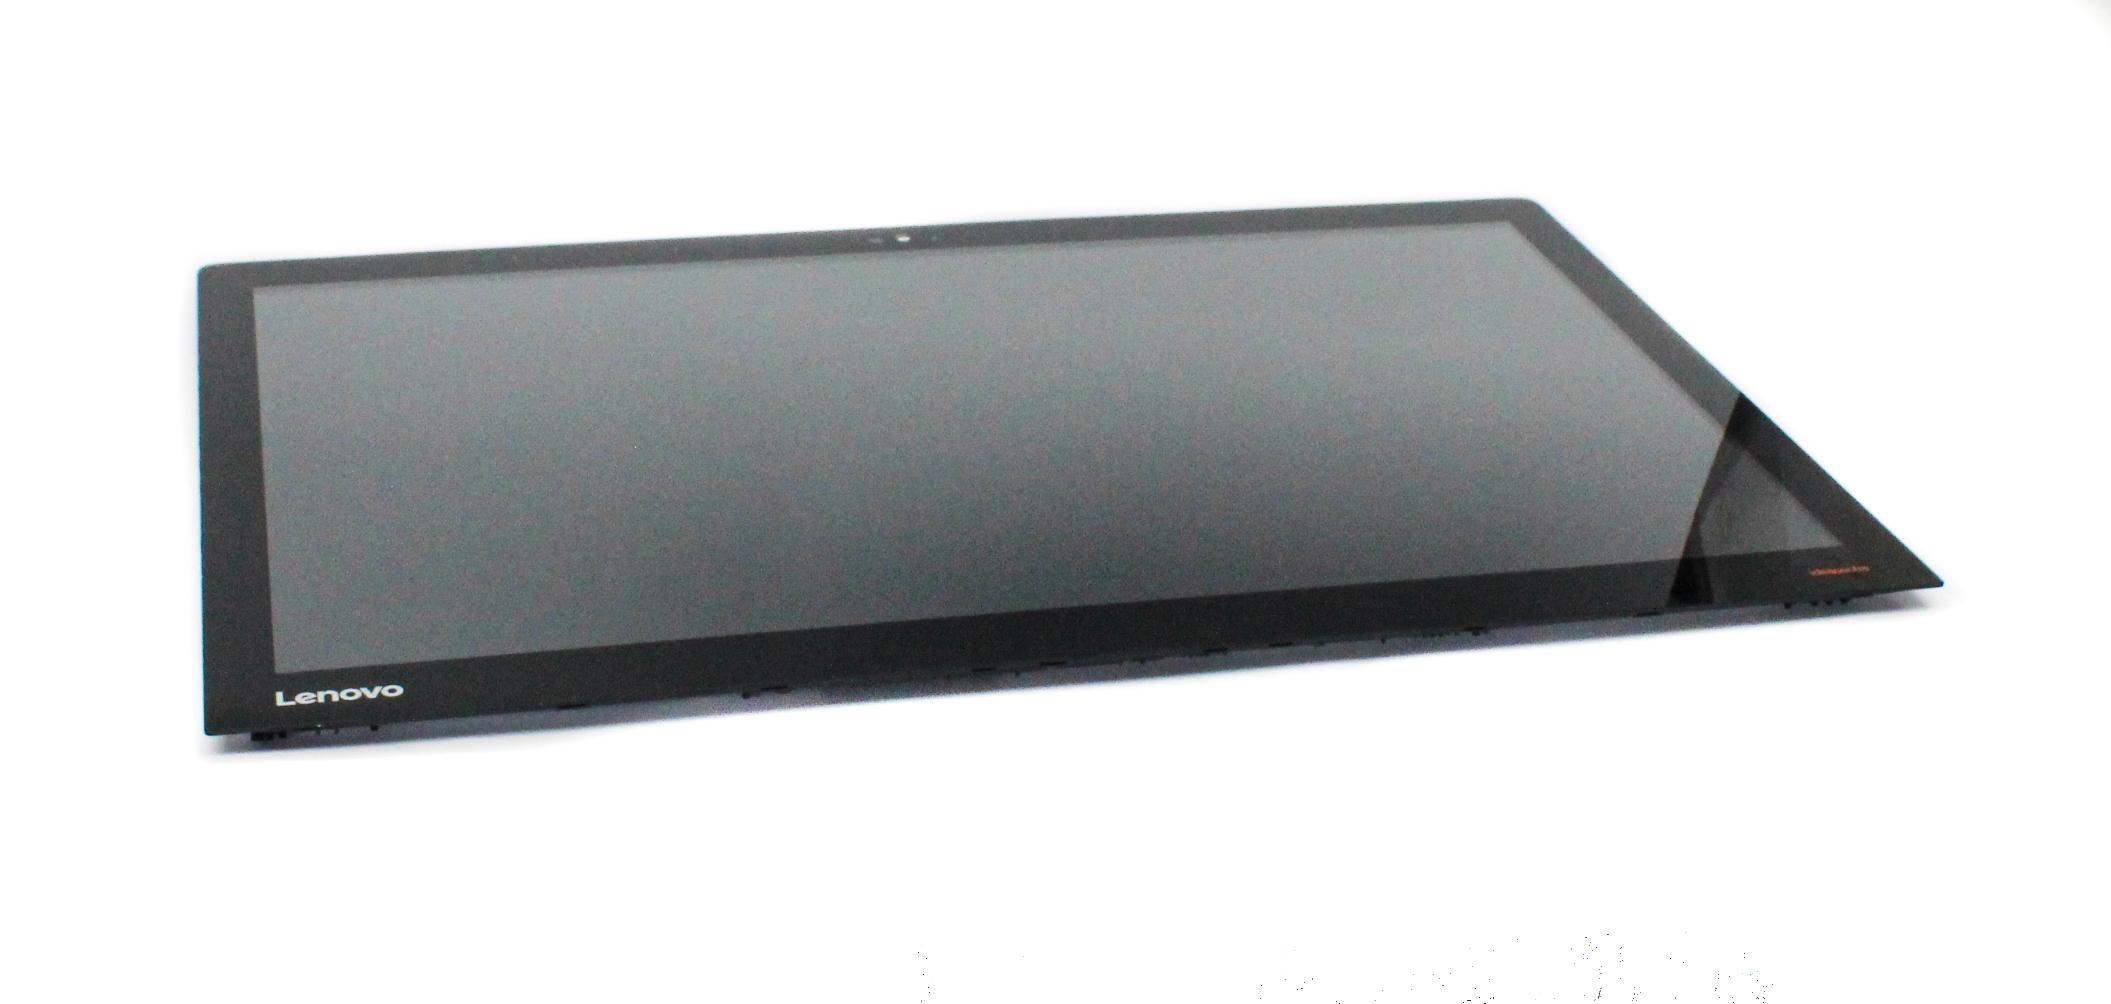 "Lenovo 01MN077 27.0"" UHD Touchscreen Panel Assembly /f Lenovo 910-27ISH AiO PC"